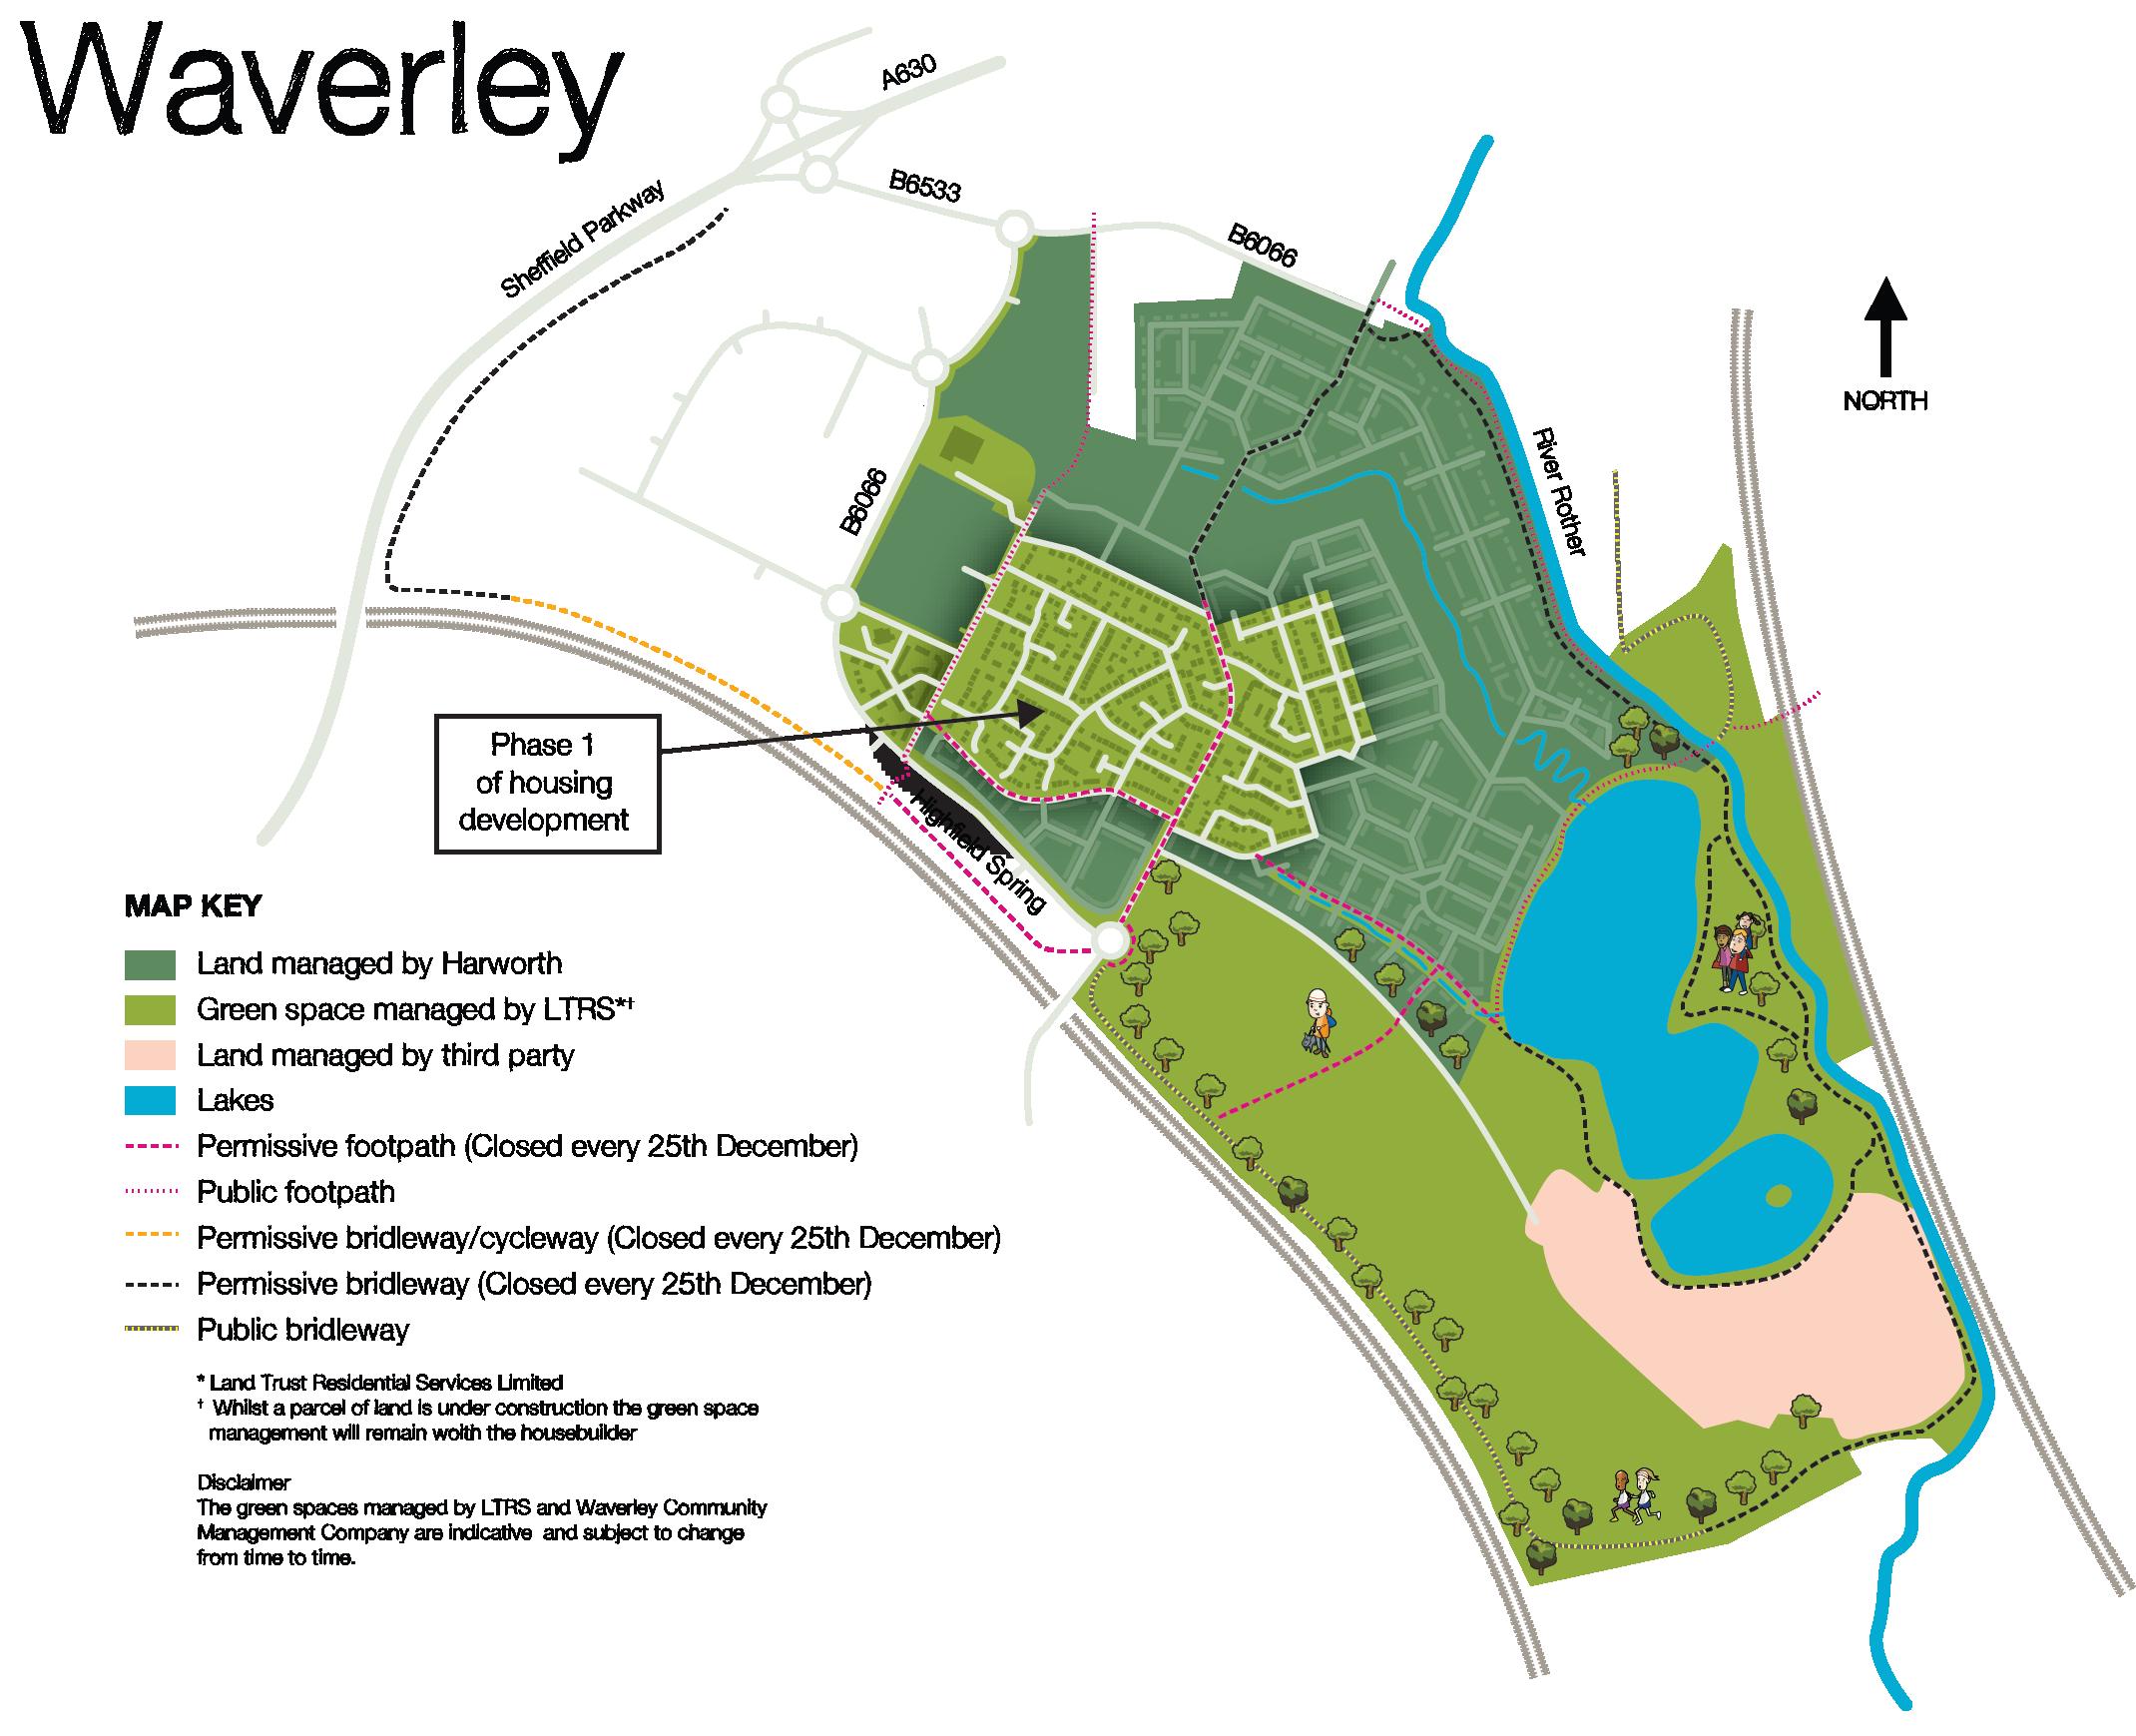 Waverley map